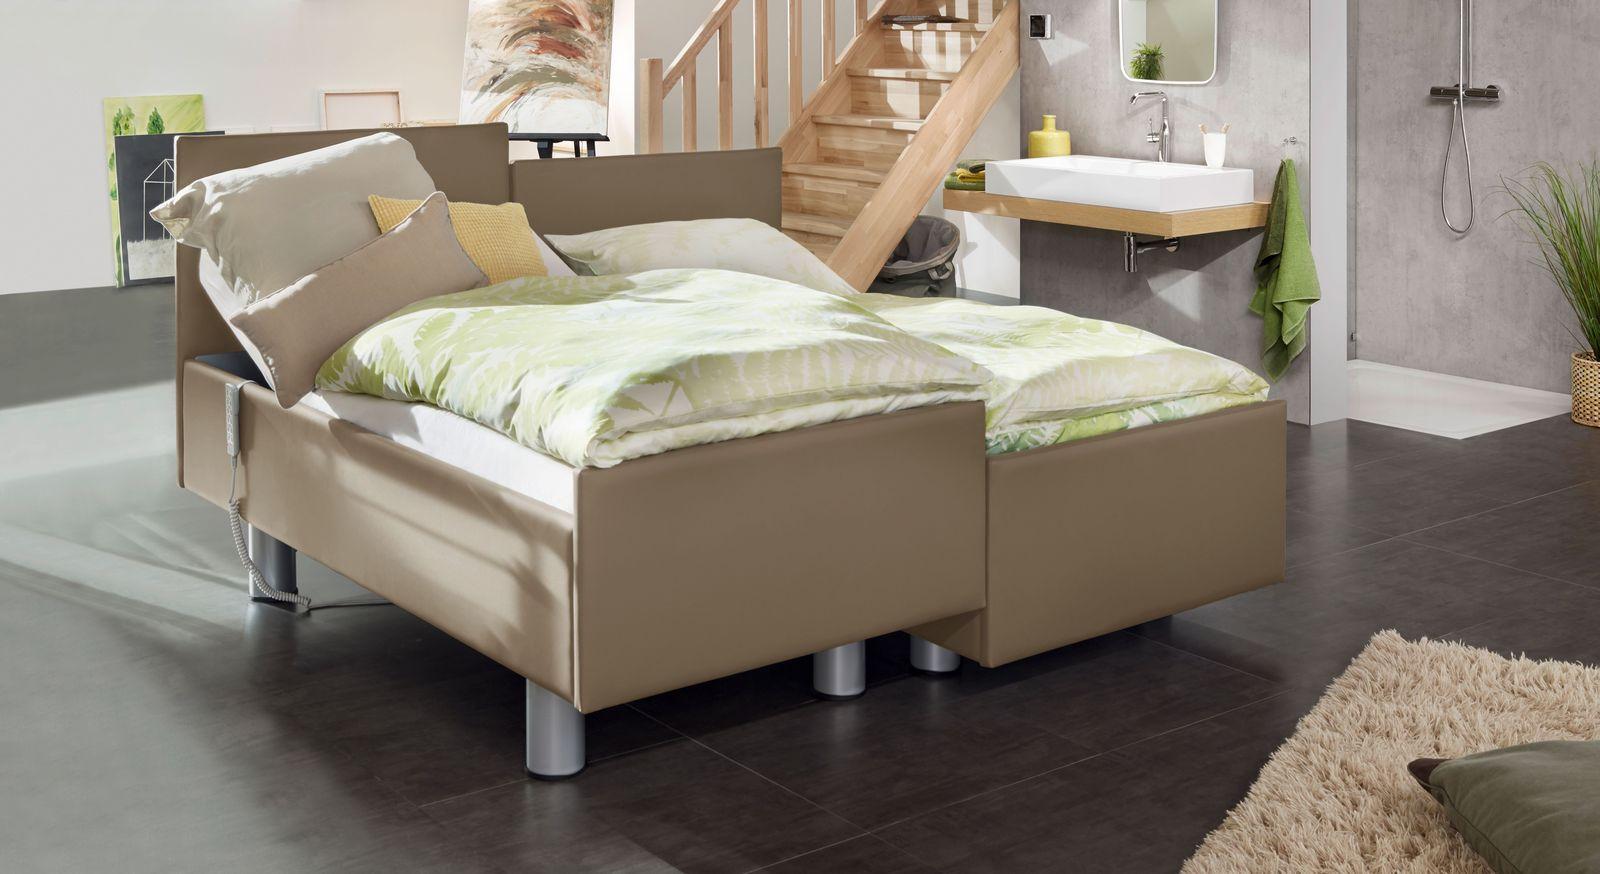 Komfortbett mit Pflegebett-Funktion Fulda in taupefarbenem Kunstleder